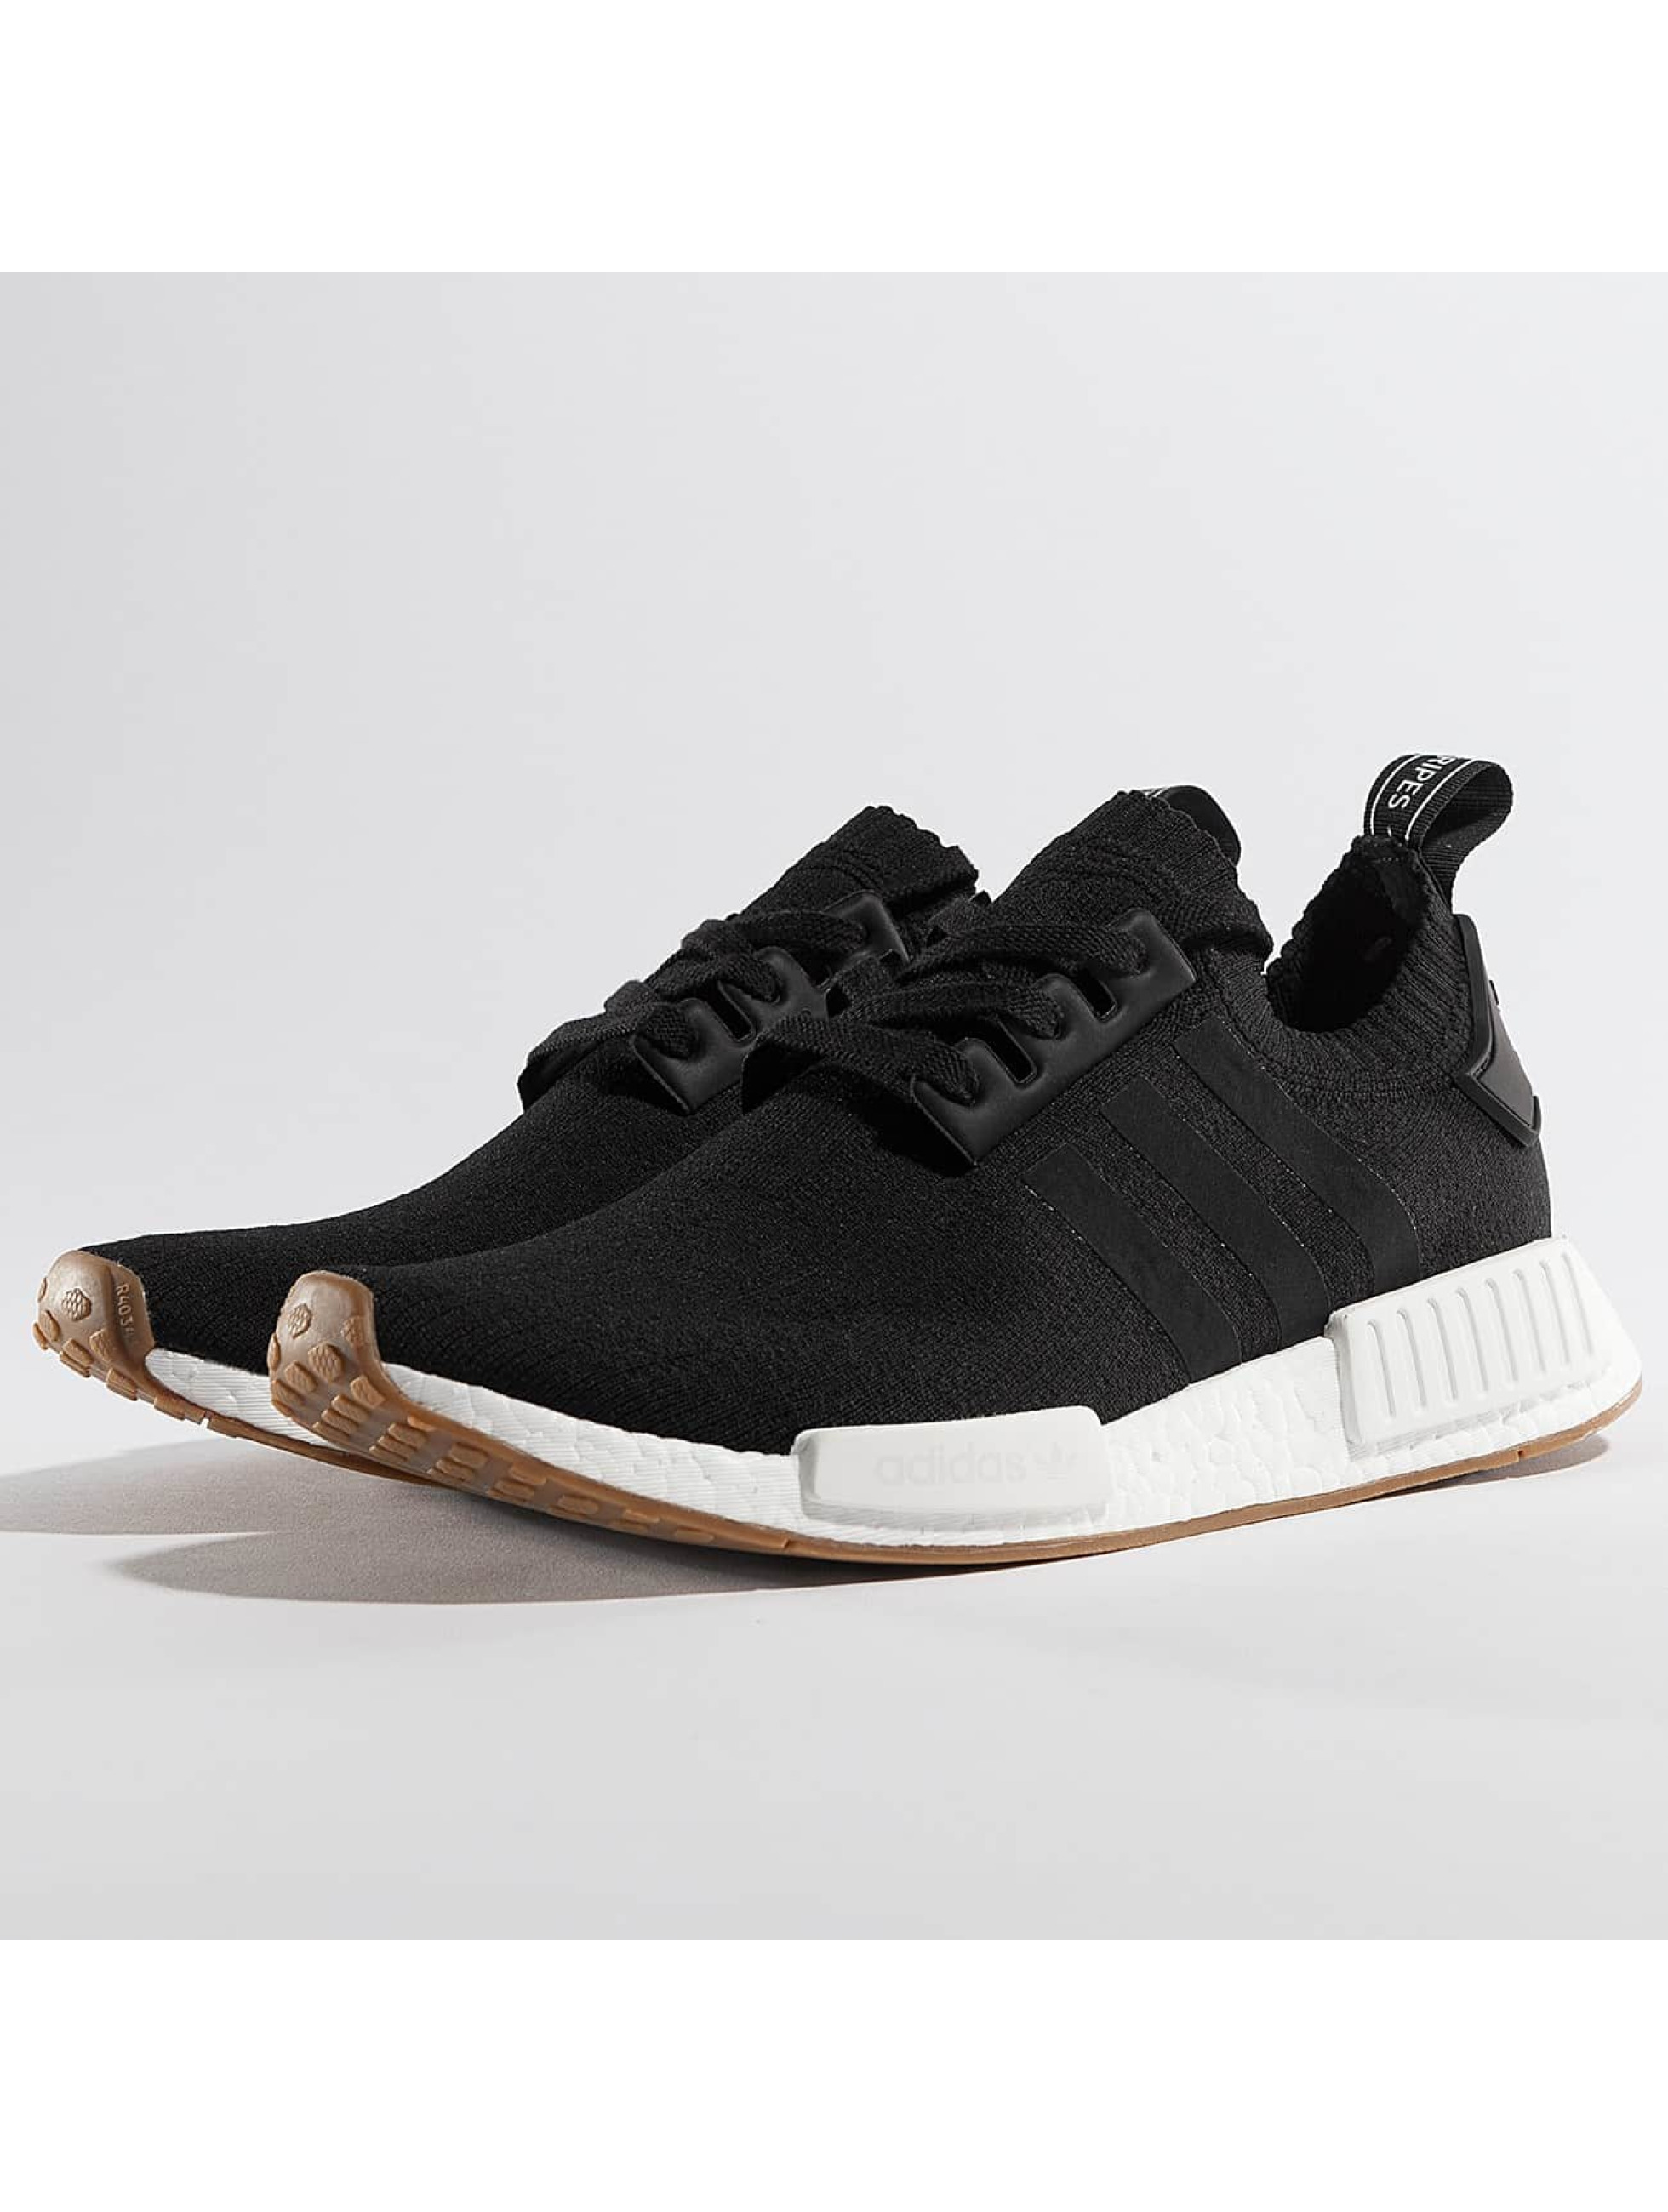 adidas nmd r1 noir